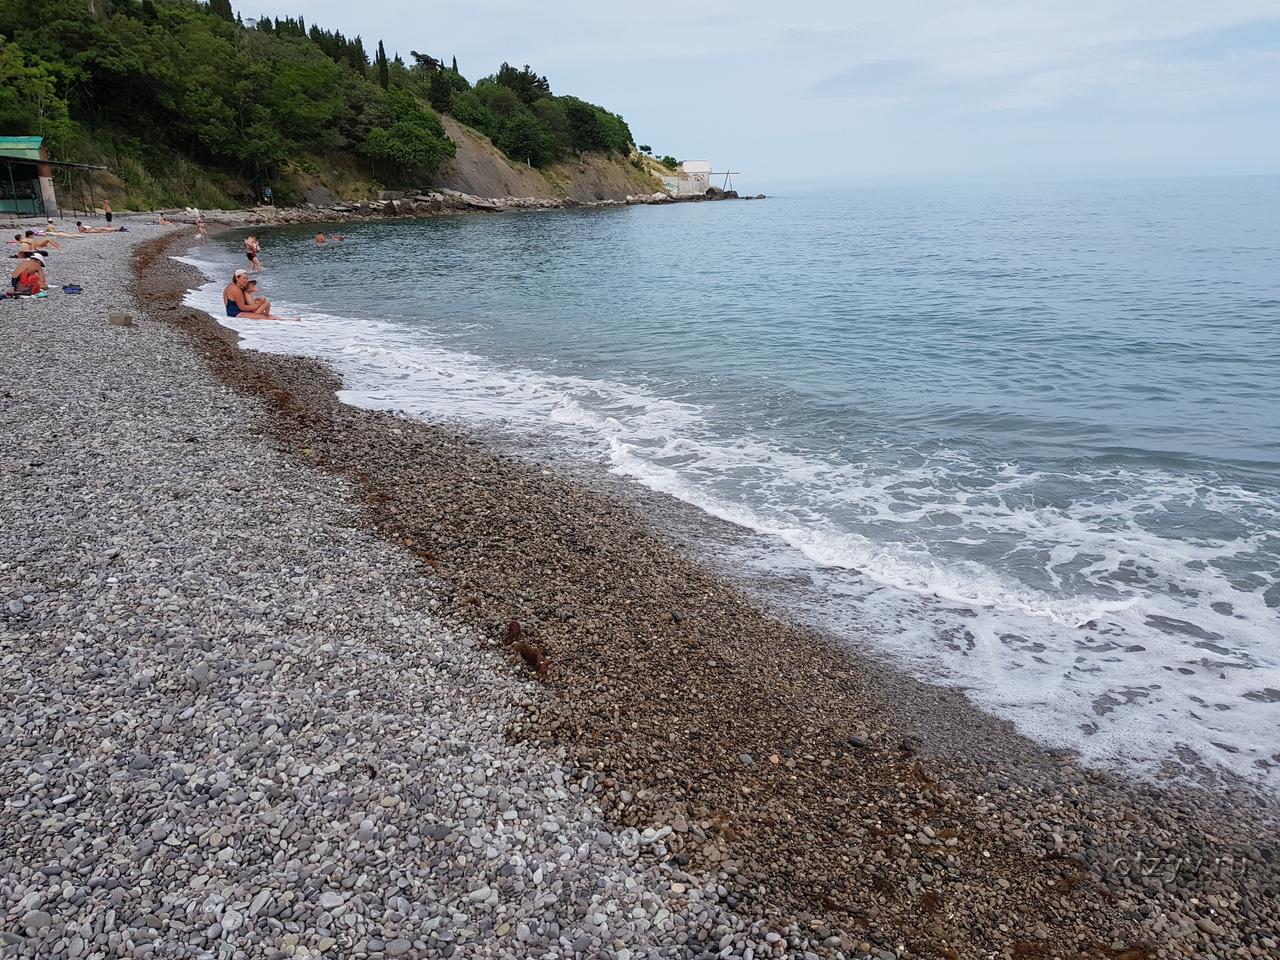 Пляжи лягушка в алупке фото